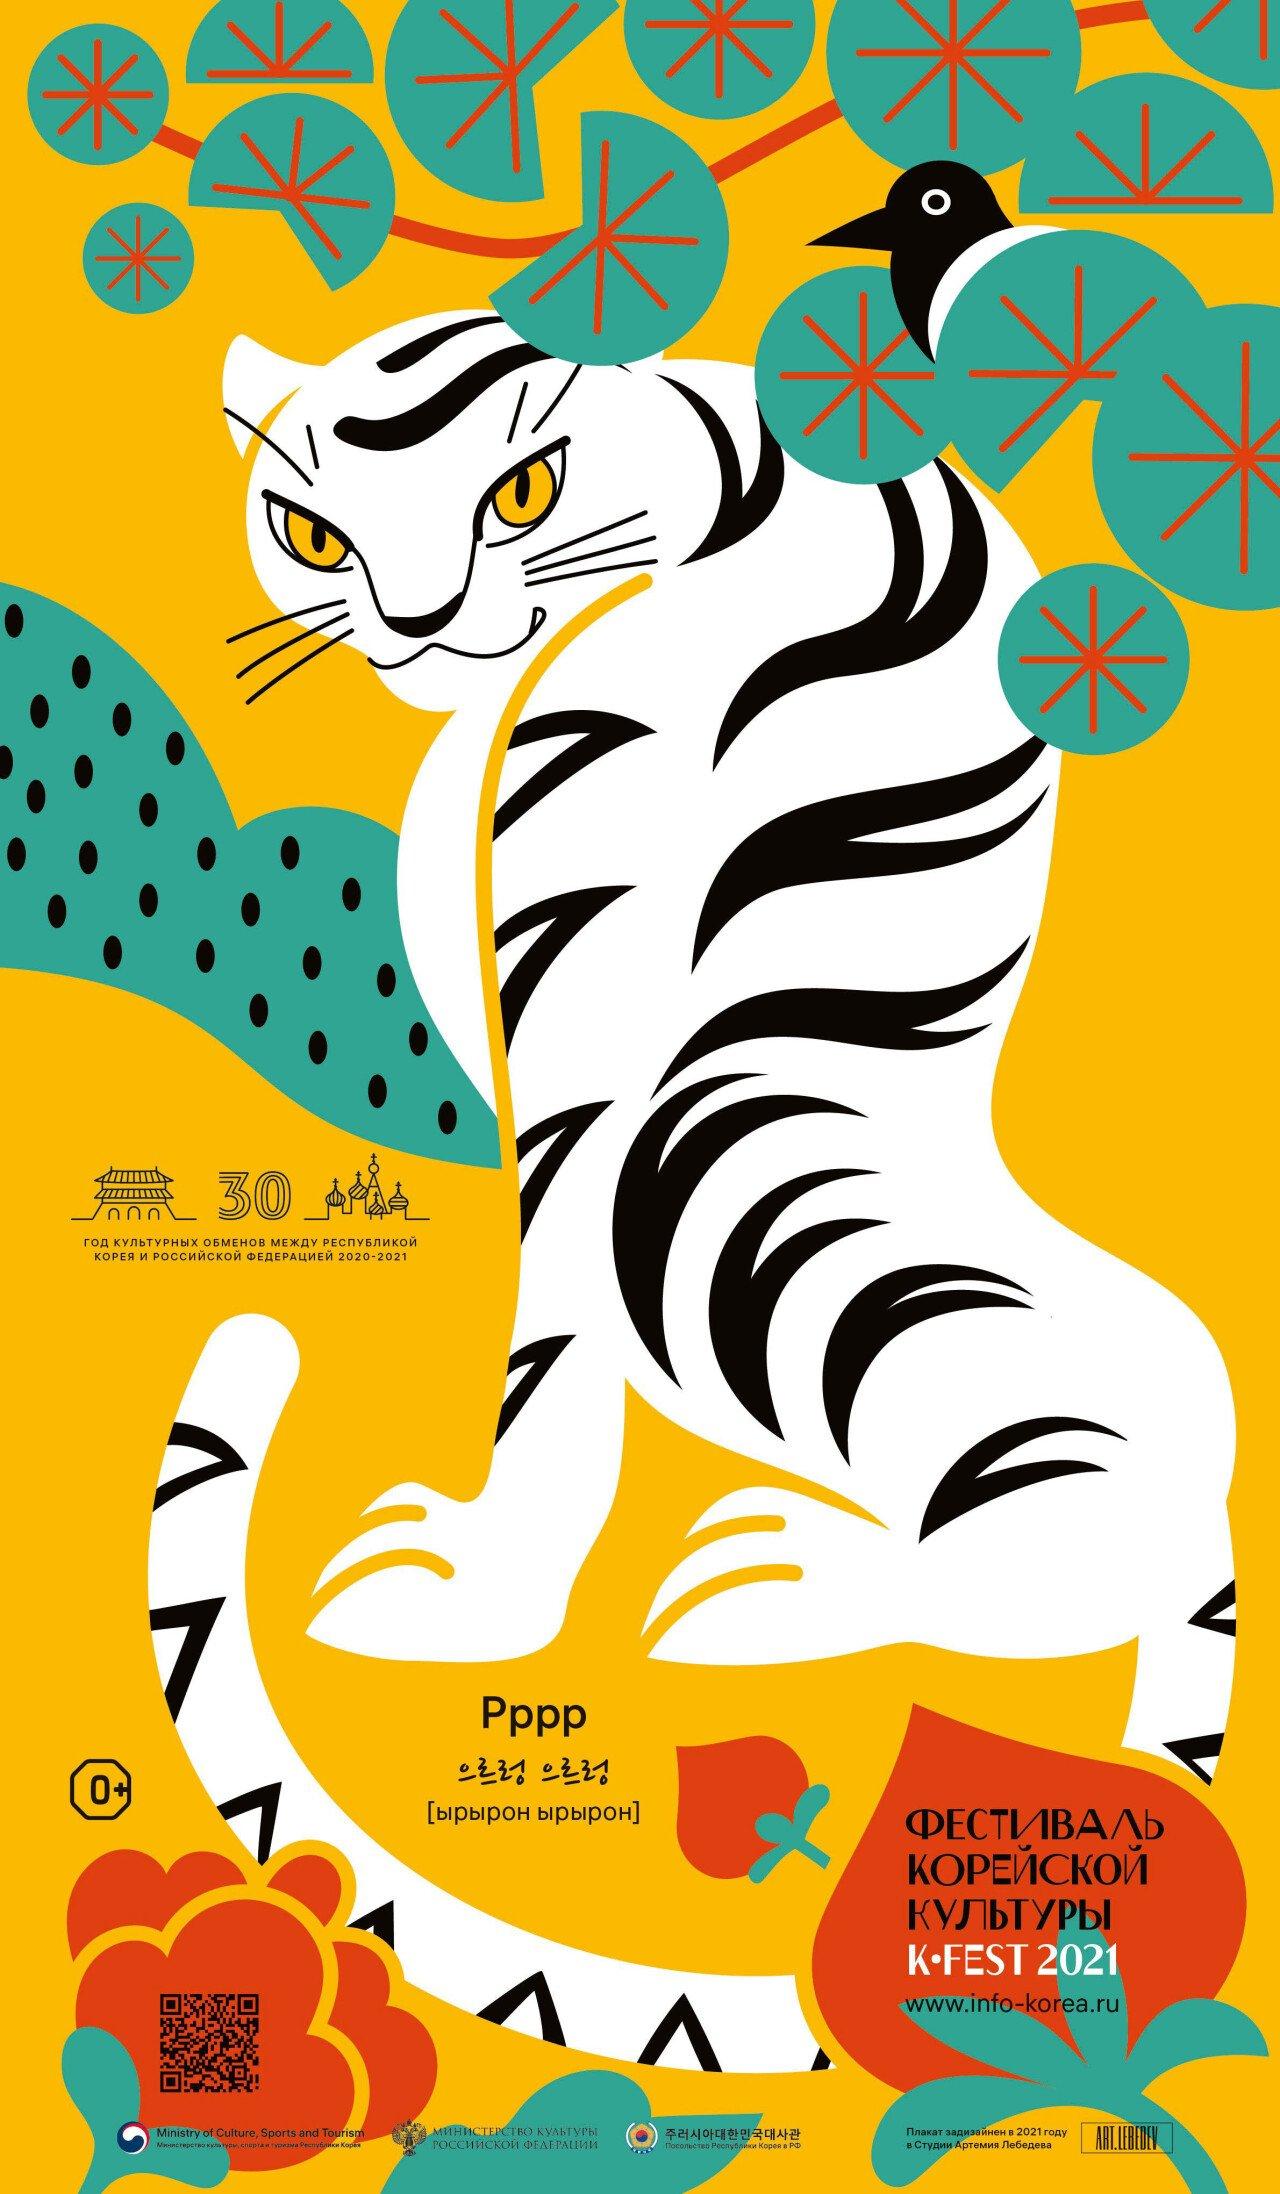 7.jpg 러시아가 공개한 한국 수교 30주년 포스터 ㄷㄷㄷ.jpg